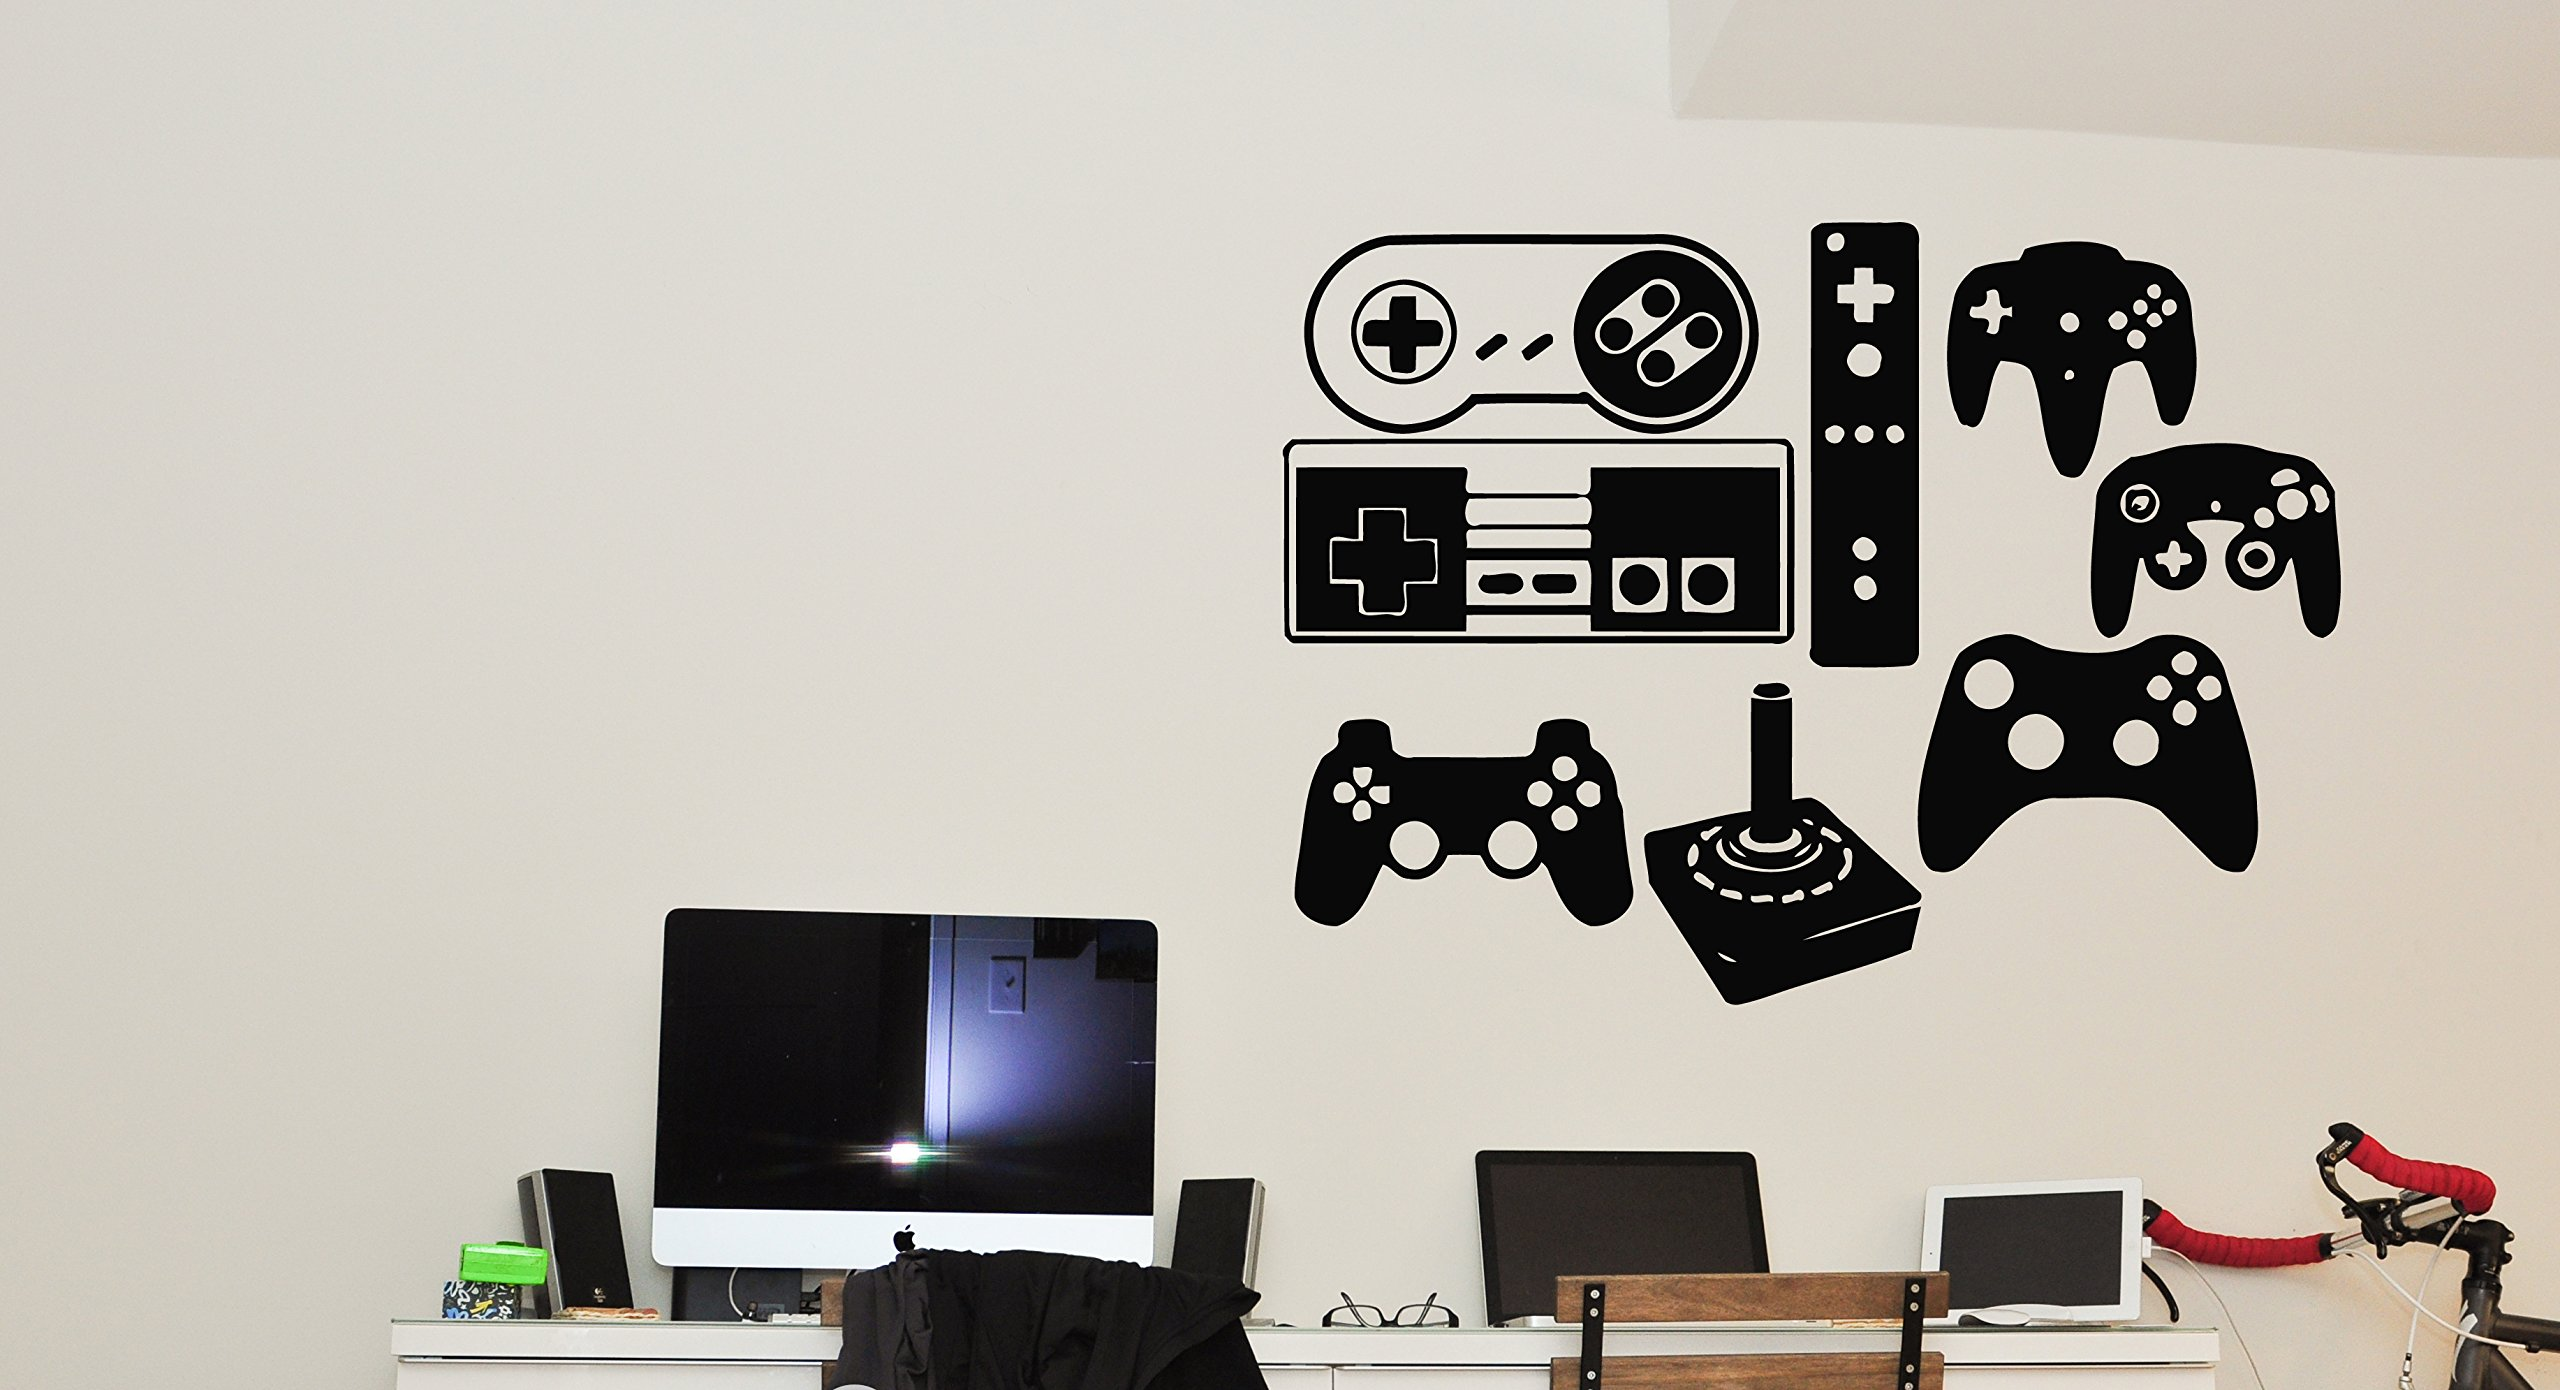 Wall Vinyl Sticker Decals Mural Room Design Pattern bedroom computer video games x box controller nursery bo2665